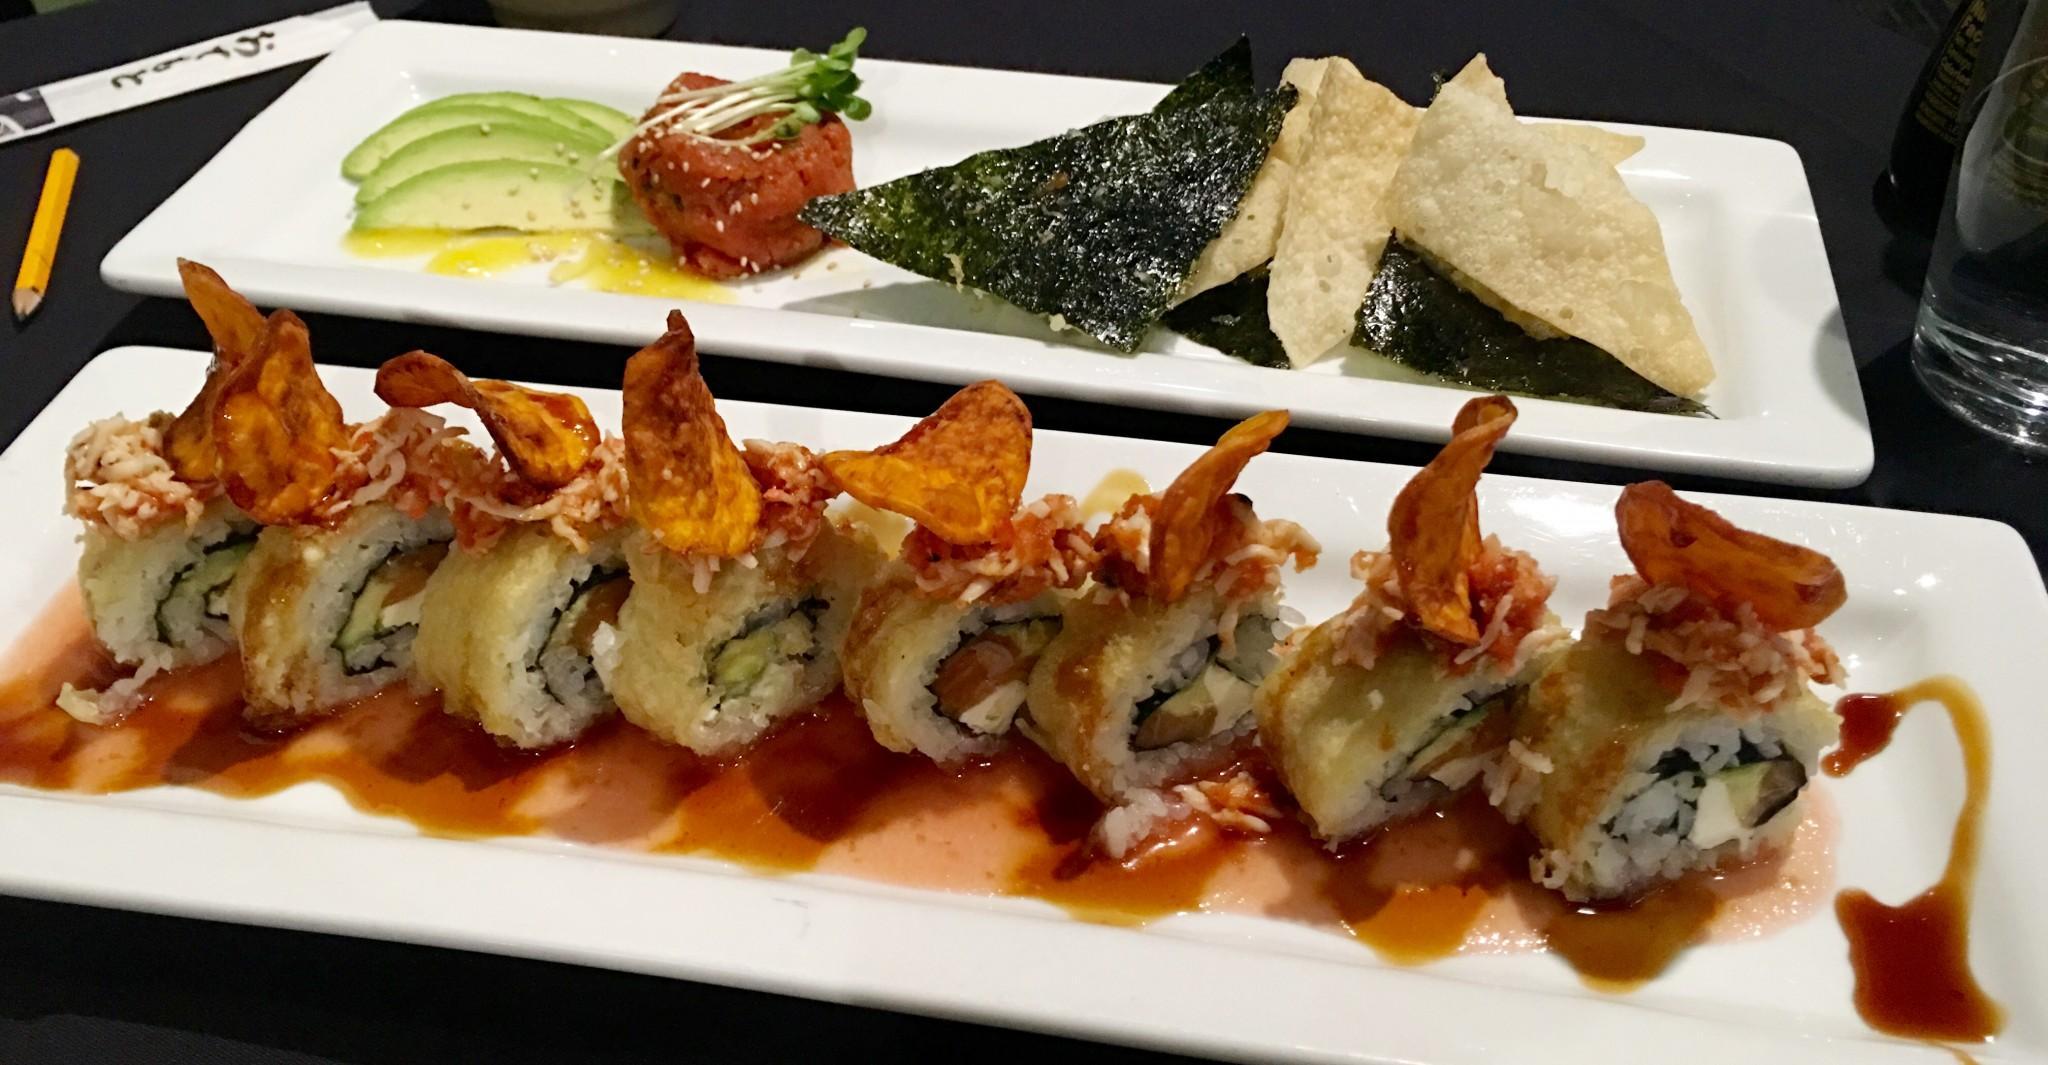 Tuna Tartar and Vegas Lights roll at Wabi Sabi Restaurant. Photo by Rachael Worthington.